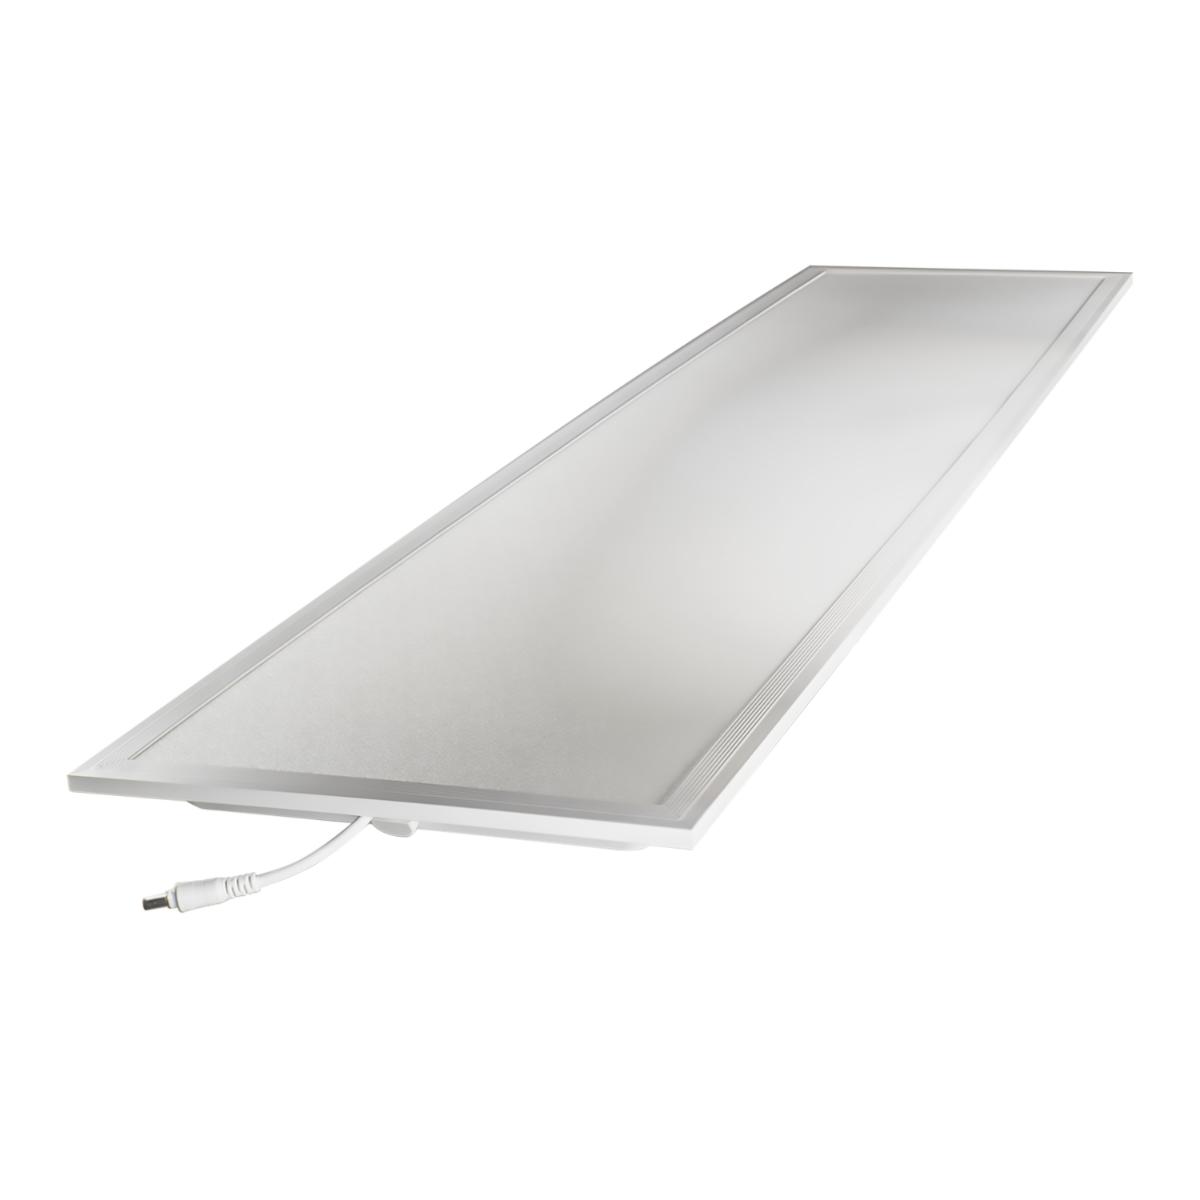 Noxion LED Panel Delta Pro Highlum V2.0 Xitanium DALI 40W 30x120cm 3000K 5280lm UGR <19   Dali Dimmbar - Warmweiß - Ersatz für 2x36W